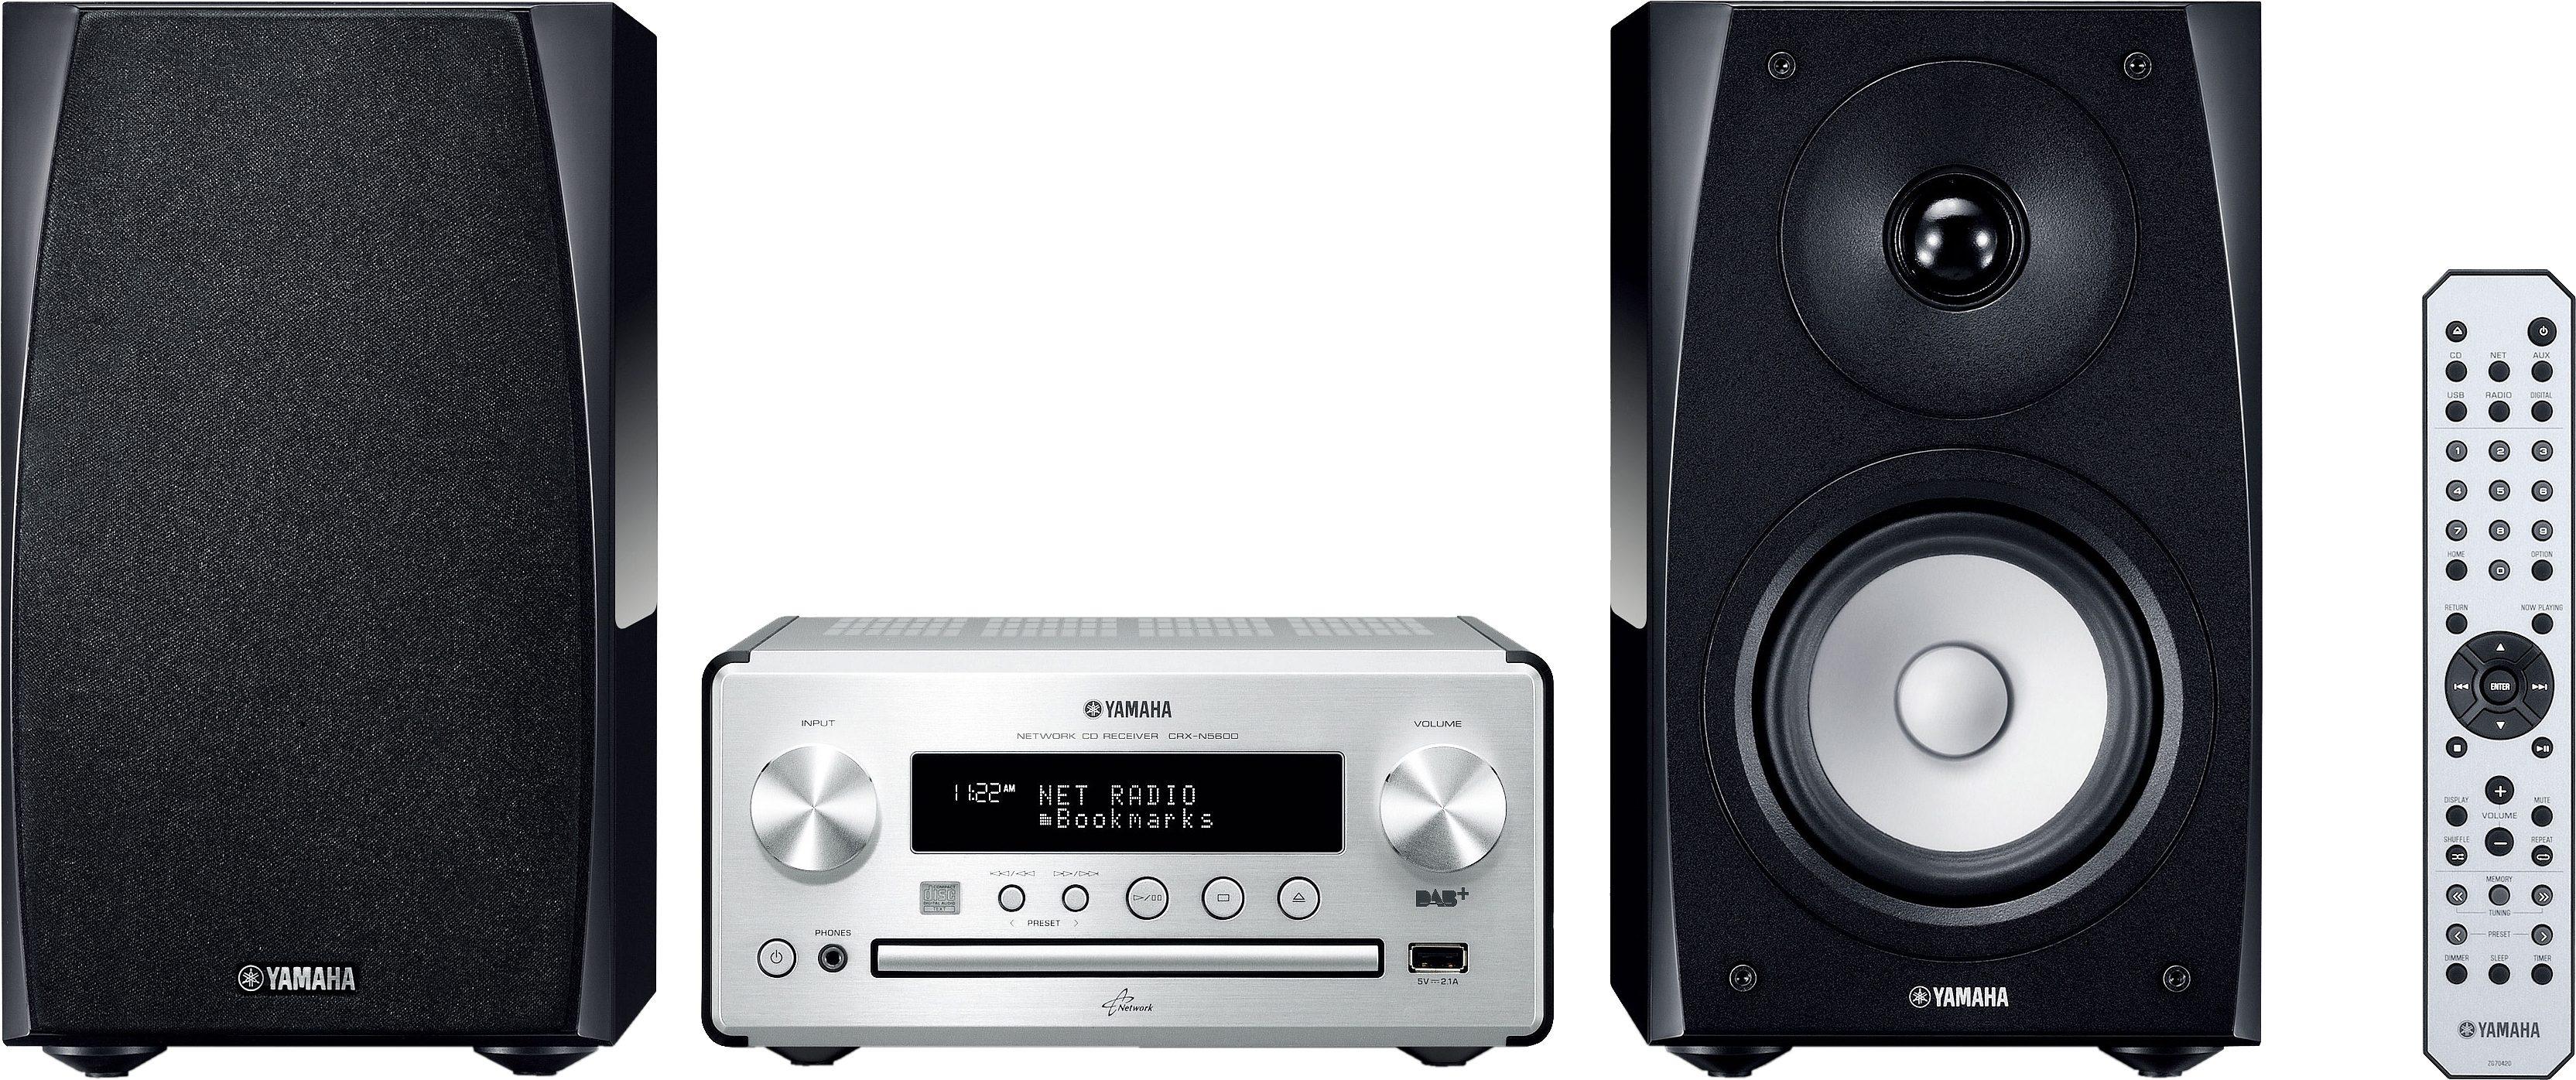 Yamaha PianoCraft MCR-N560D Kompaktanlage, Spotify, Airplay, DAB+